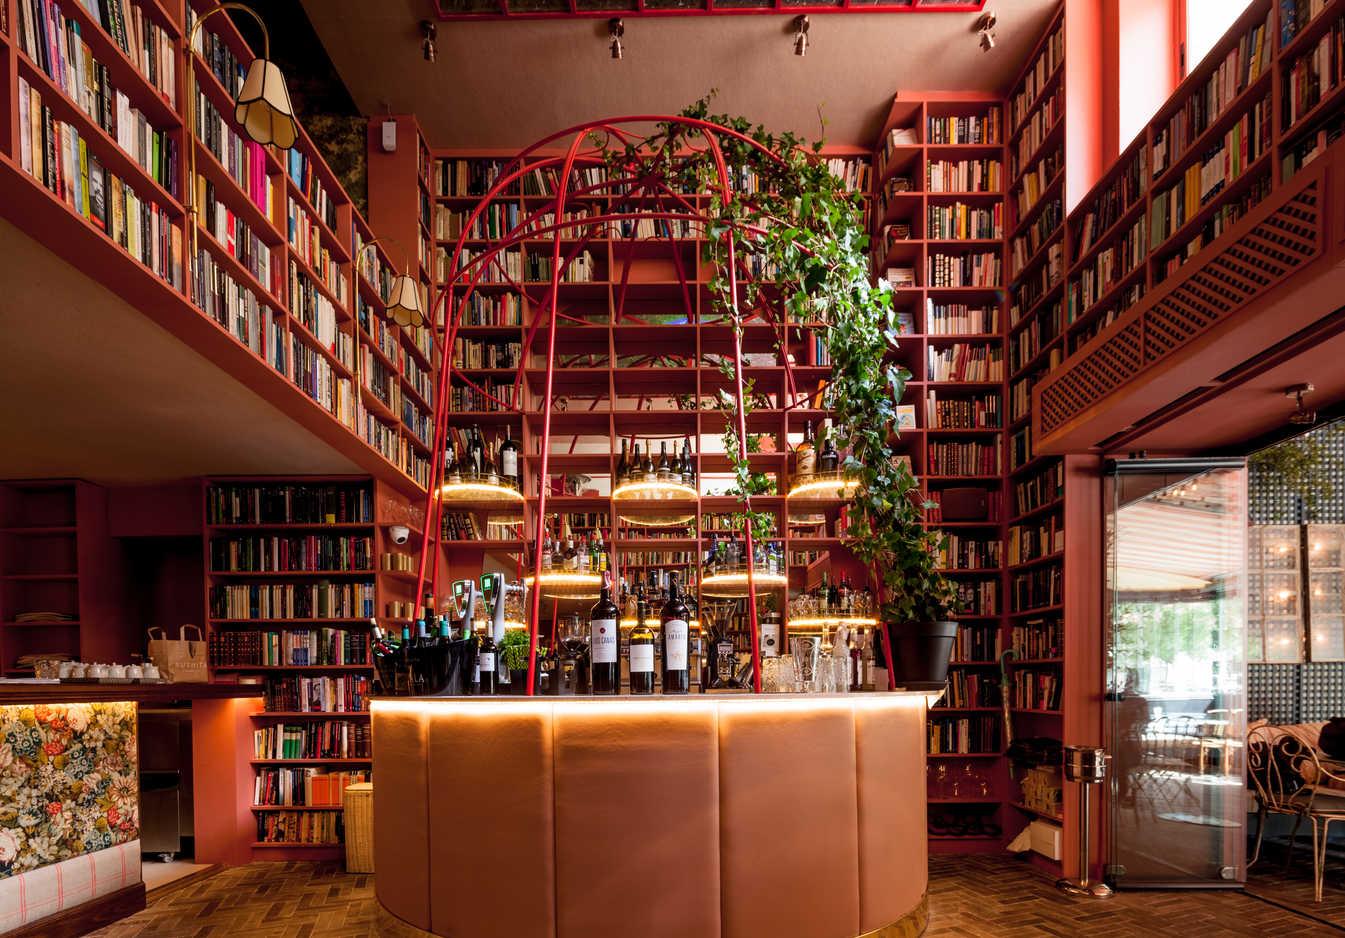 mejores restaurantes románticos Madrid - Madame Sushita